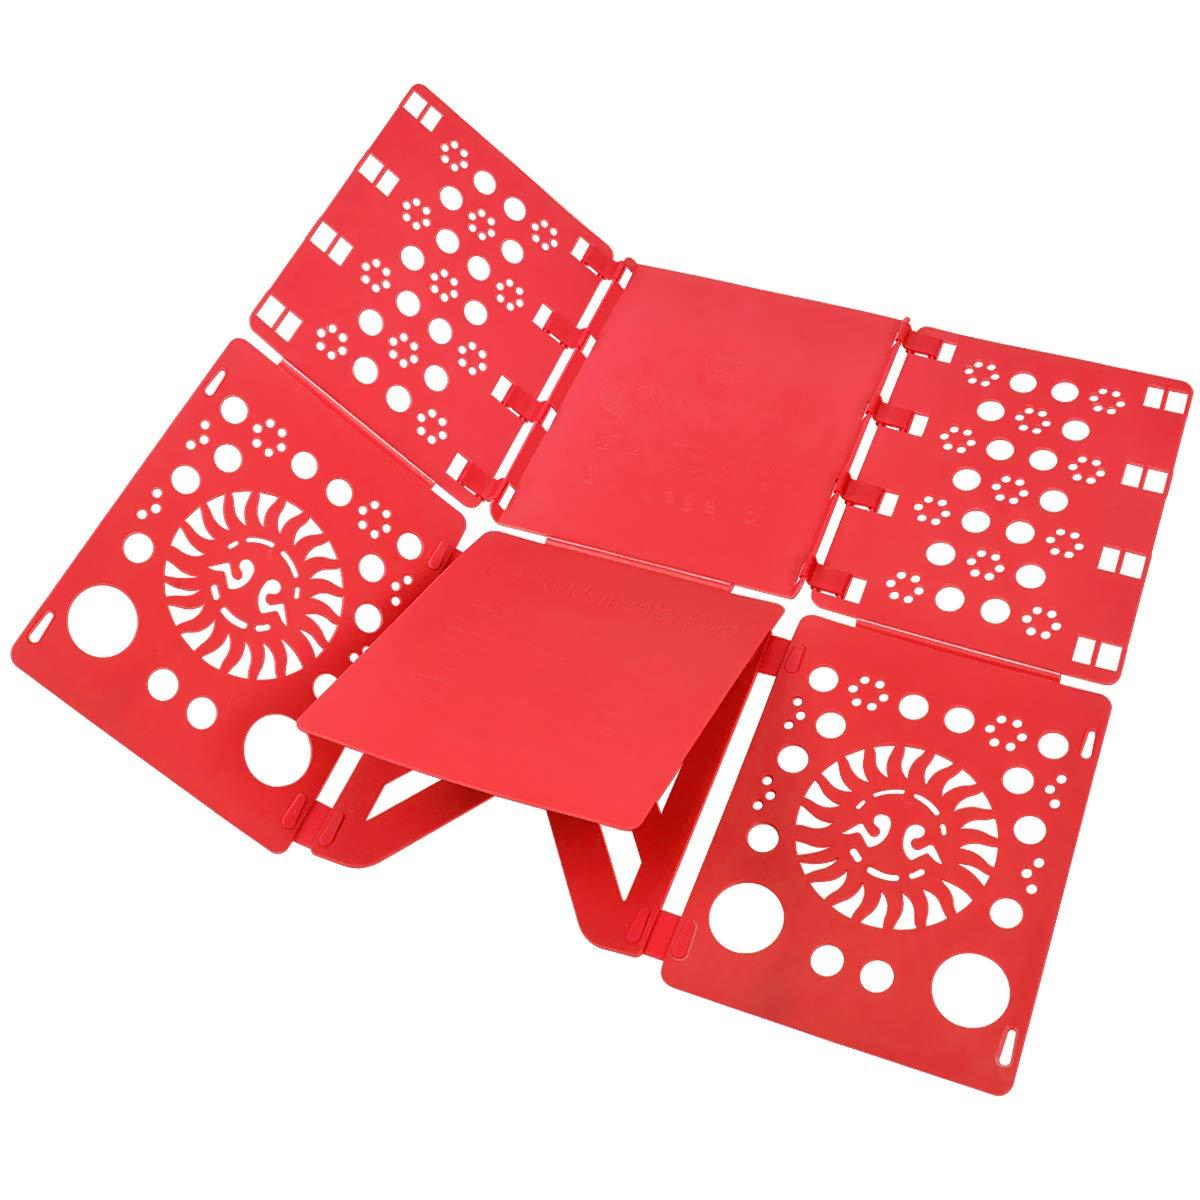 BoxLegend V2 Shirt Folding Board t Shirts Clothes Folder Durable Plastic Laundry folders Folding Boards flipfold